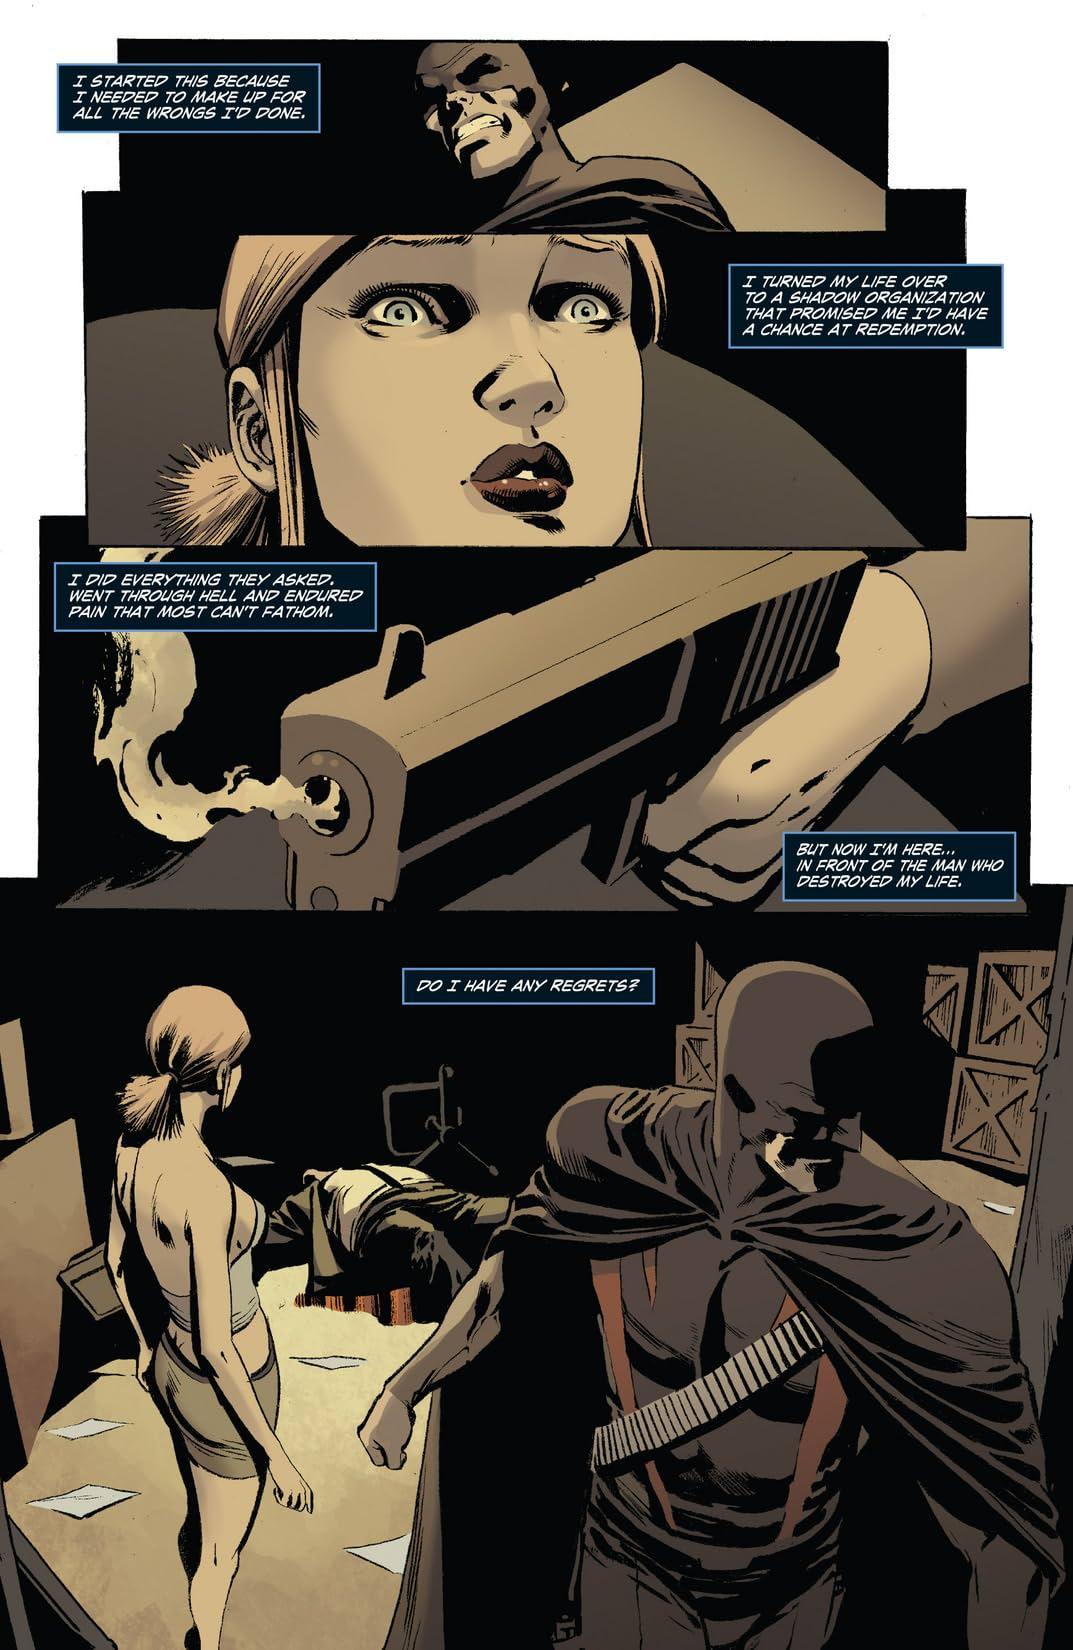 The Black Bat #8